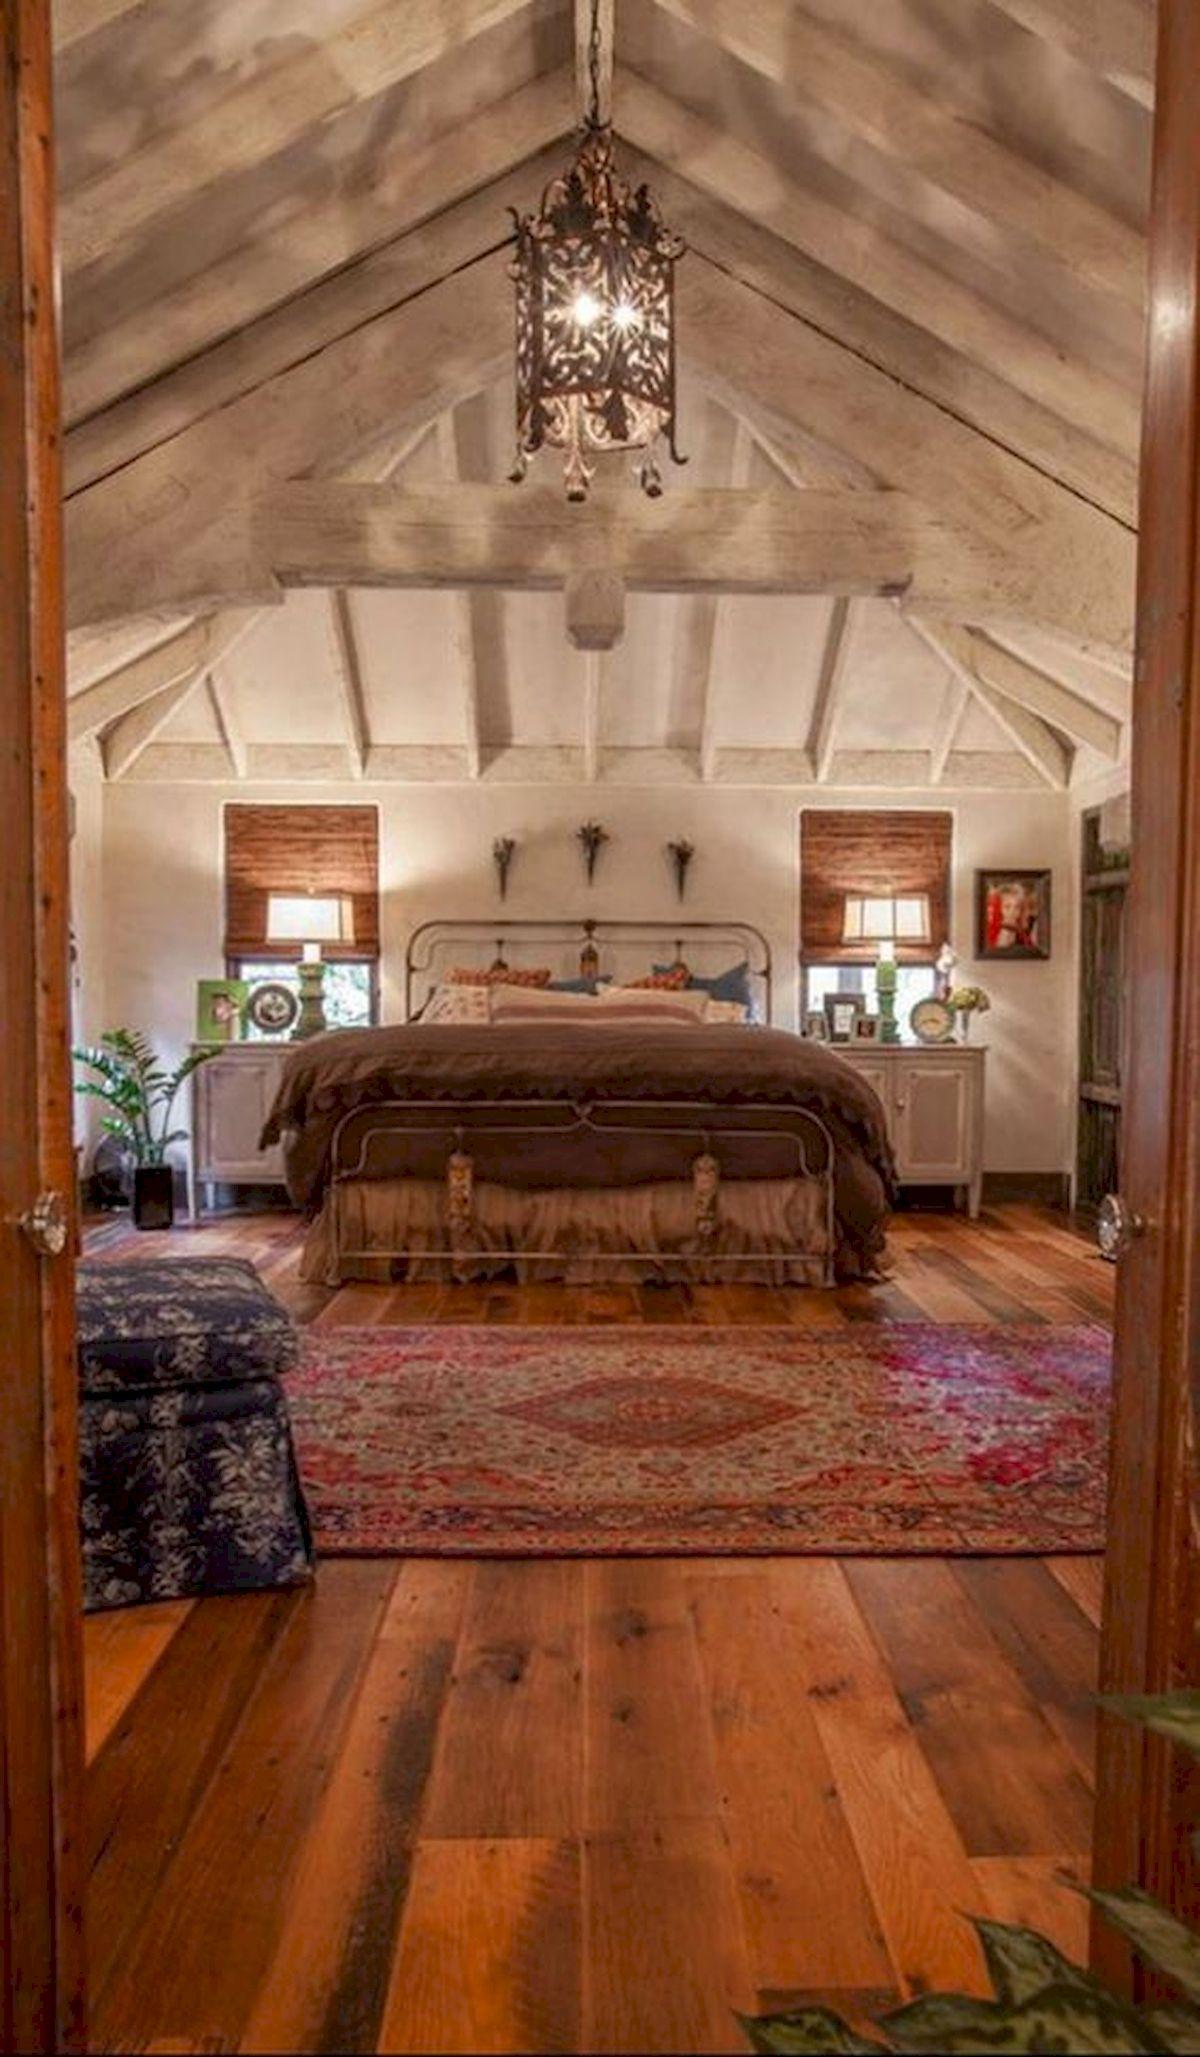 40 Fantastic DIY Decor Ideas For Farmhouse Boho Bedroom Design (35)